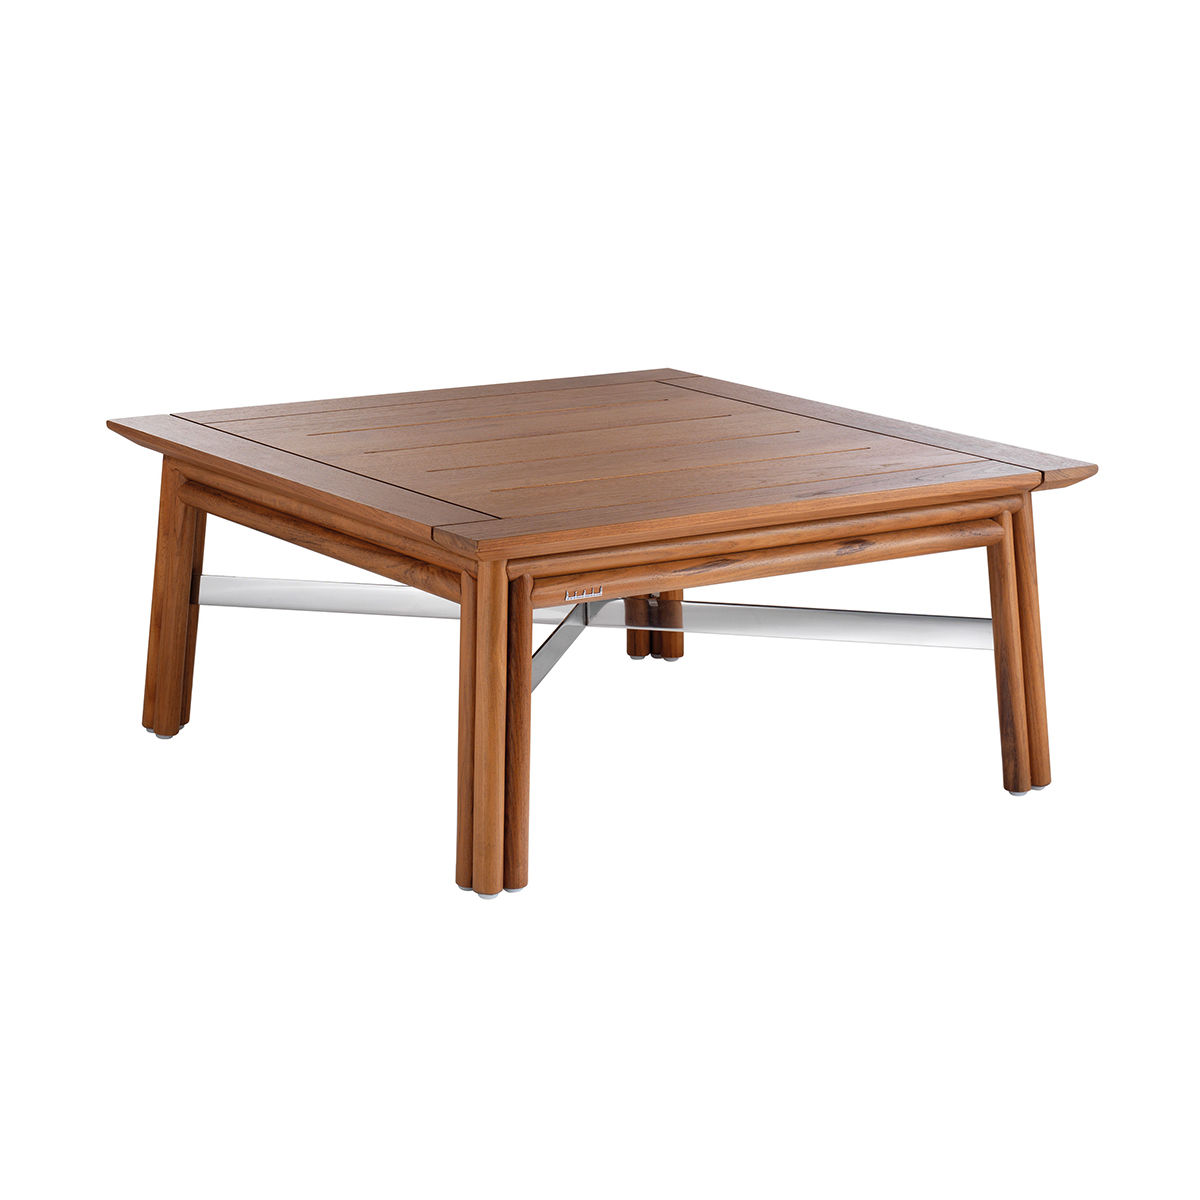 Tavolino salotto Maxim Braid